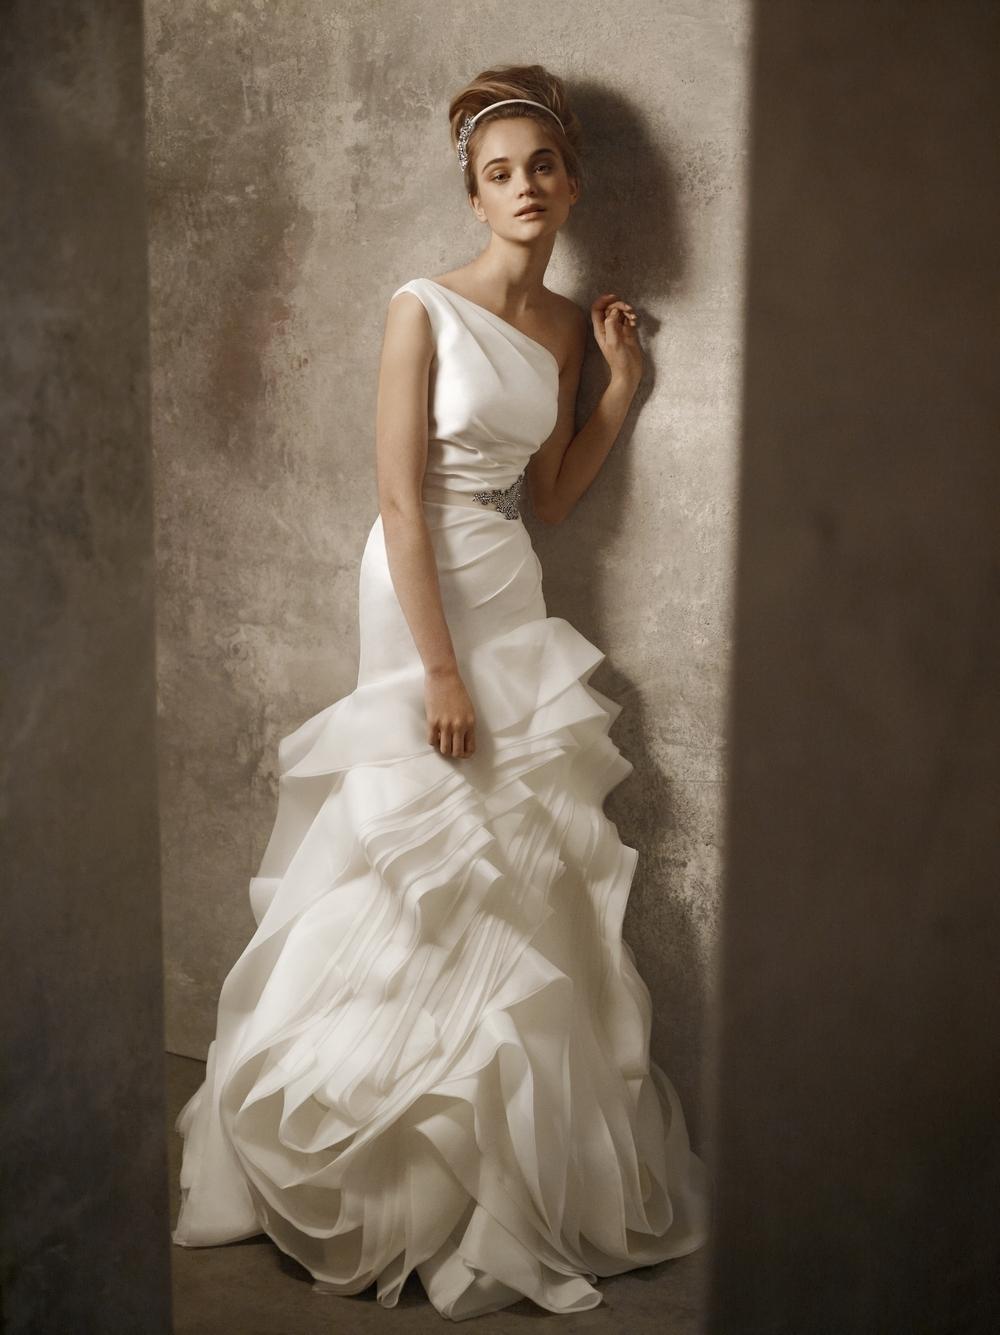 2011-wedding-dresses-vera-wang-white-vw351010-one-shoulder-ivory-gown-ruffled-textured-skirt_0.full